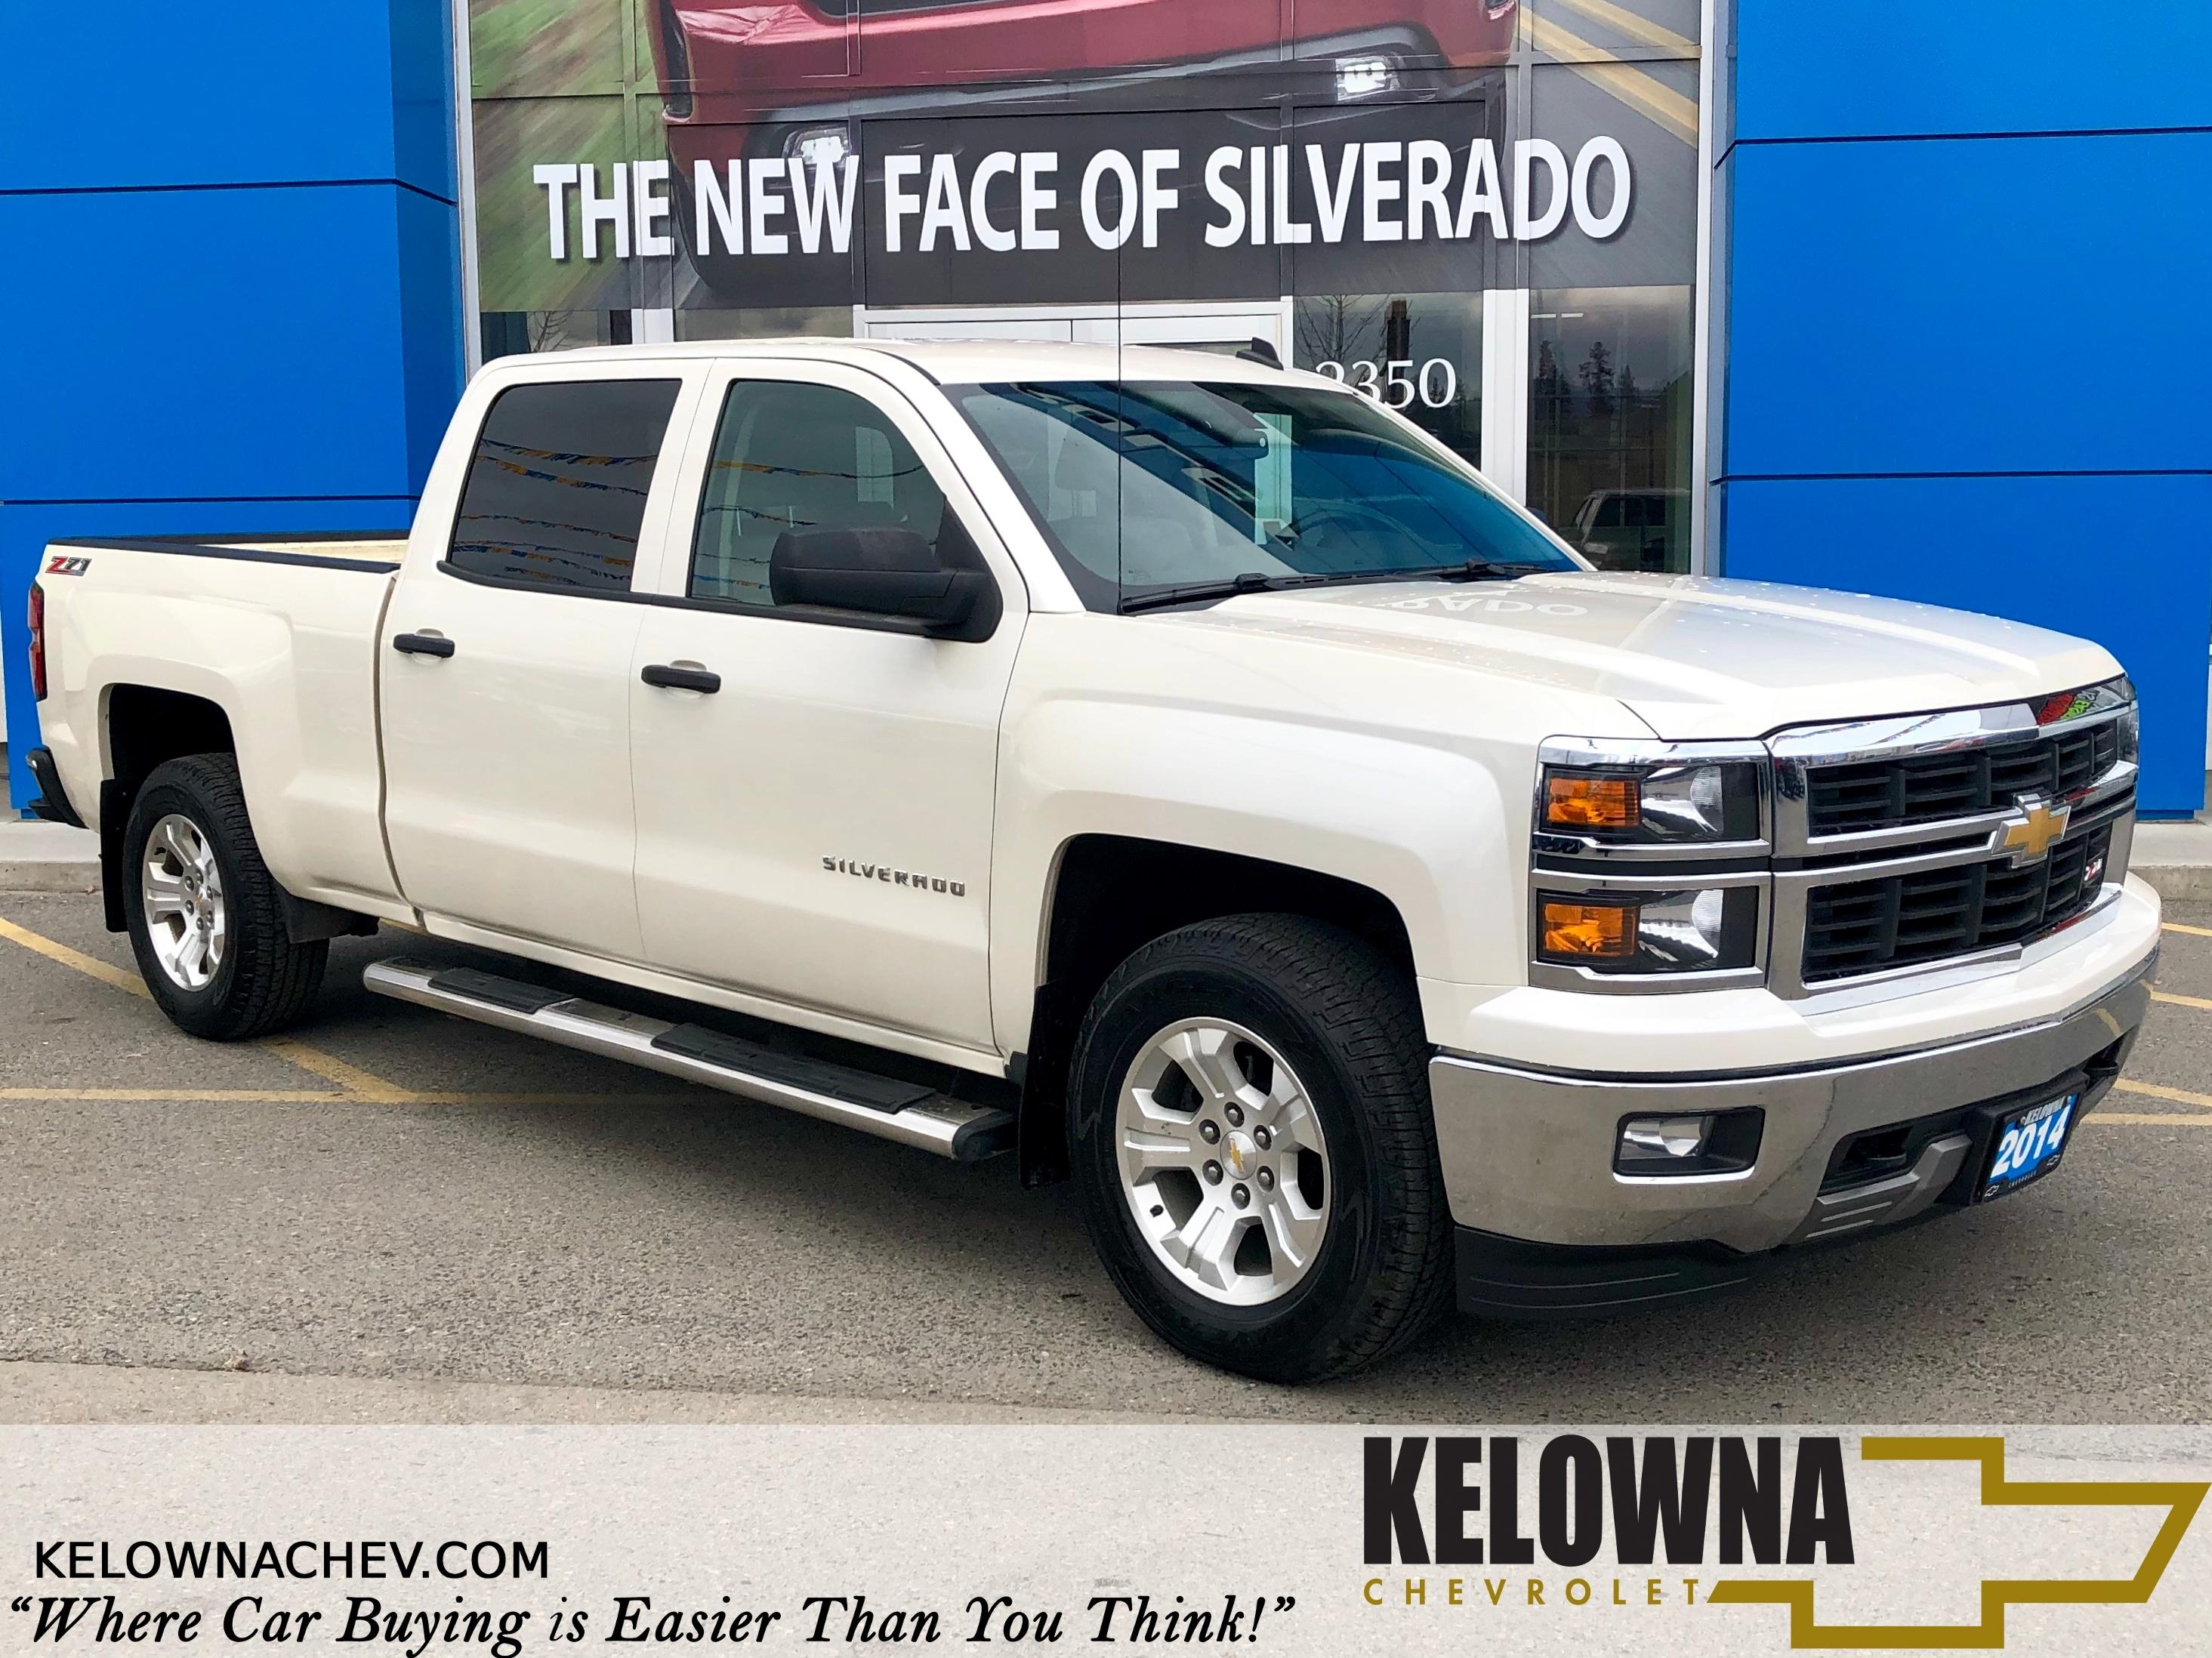 2014 Chevrolet Silverado 1500 Chevrolet MyLink, All Terrain Tires, 4x4 Truck Crew Cab